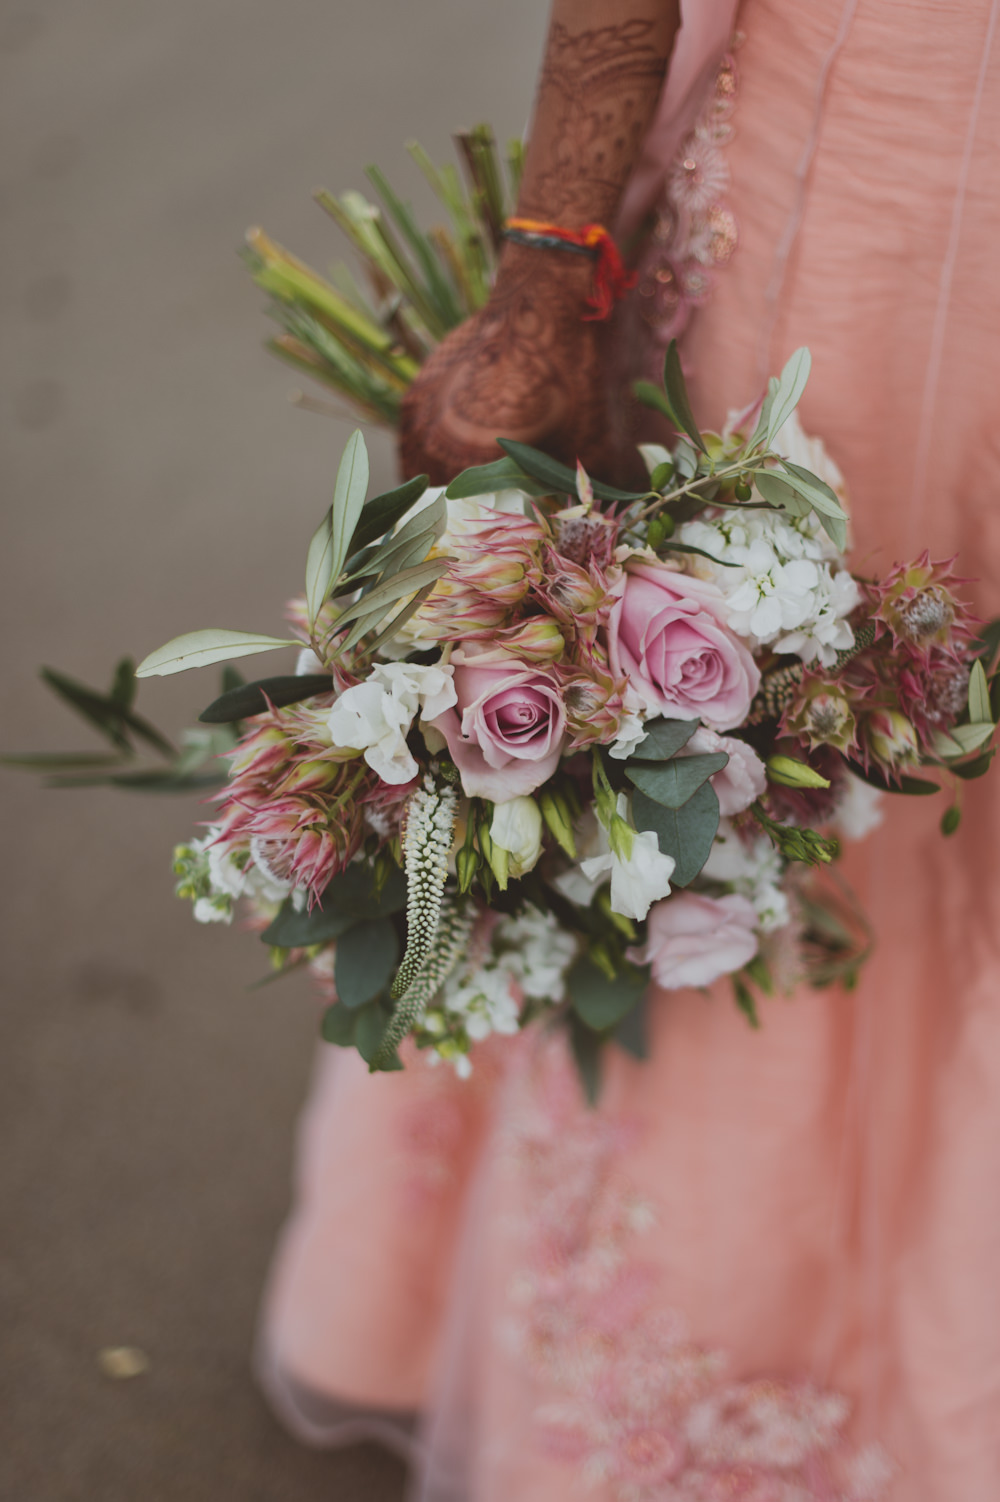 Bride Bridal Bouquet Flowers Pink Rose Greenery Newton Hall Wedding Sasha Weddings